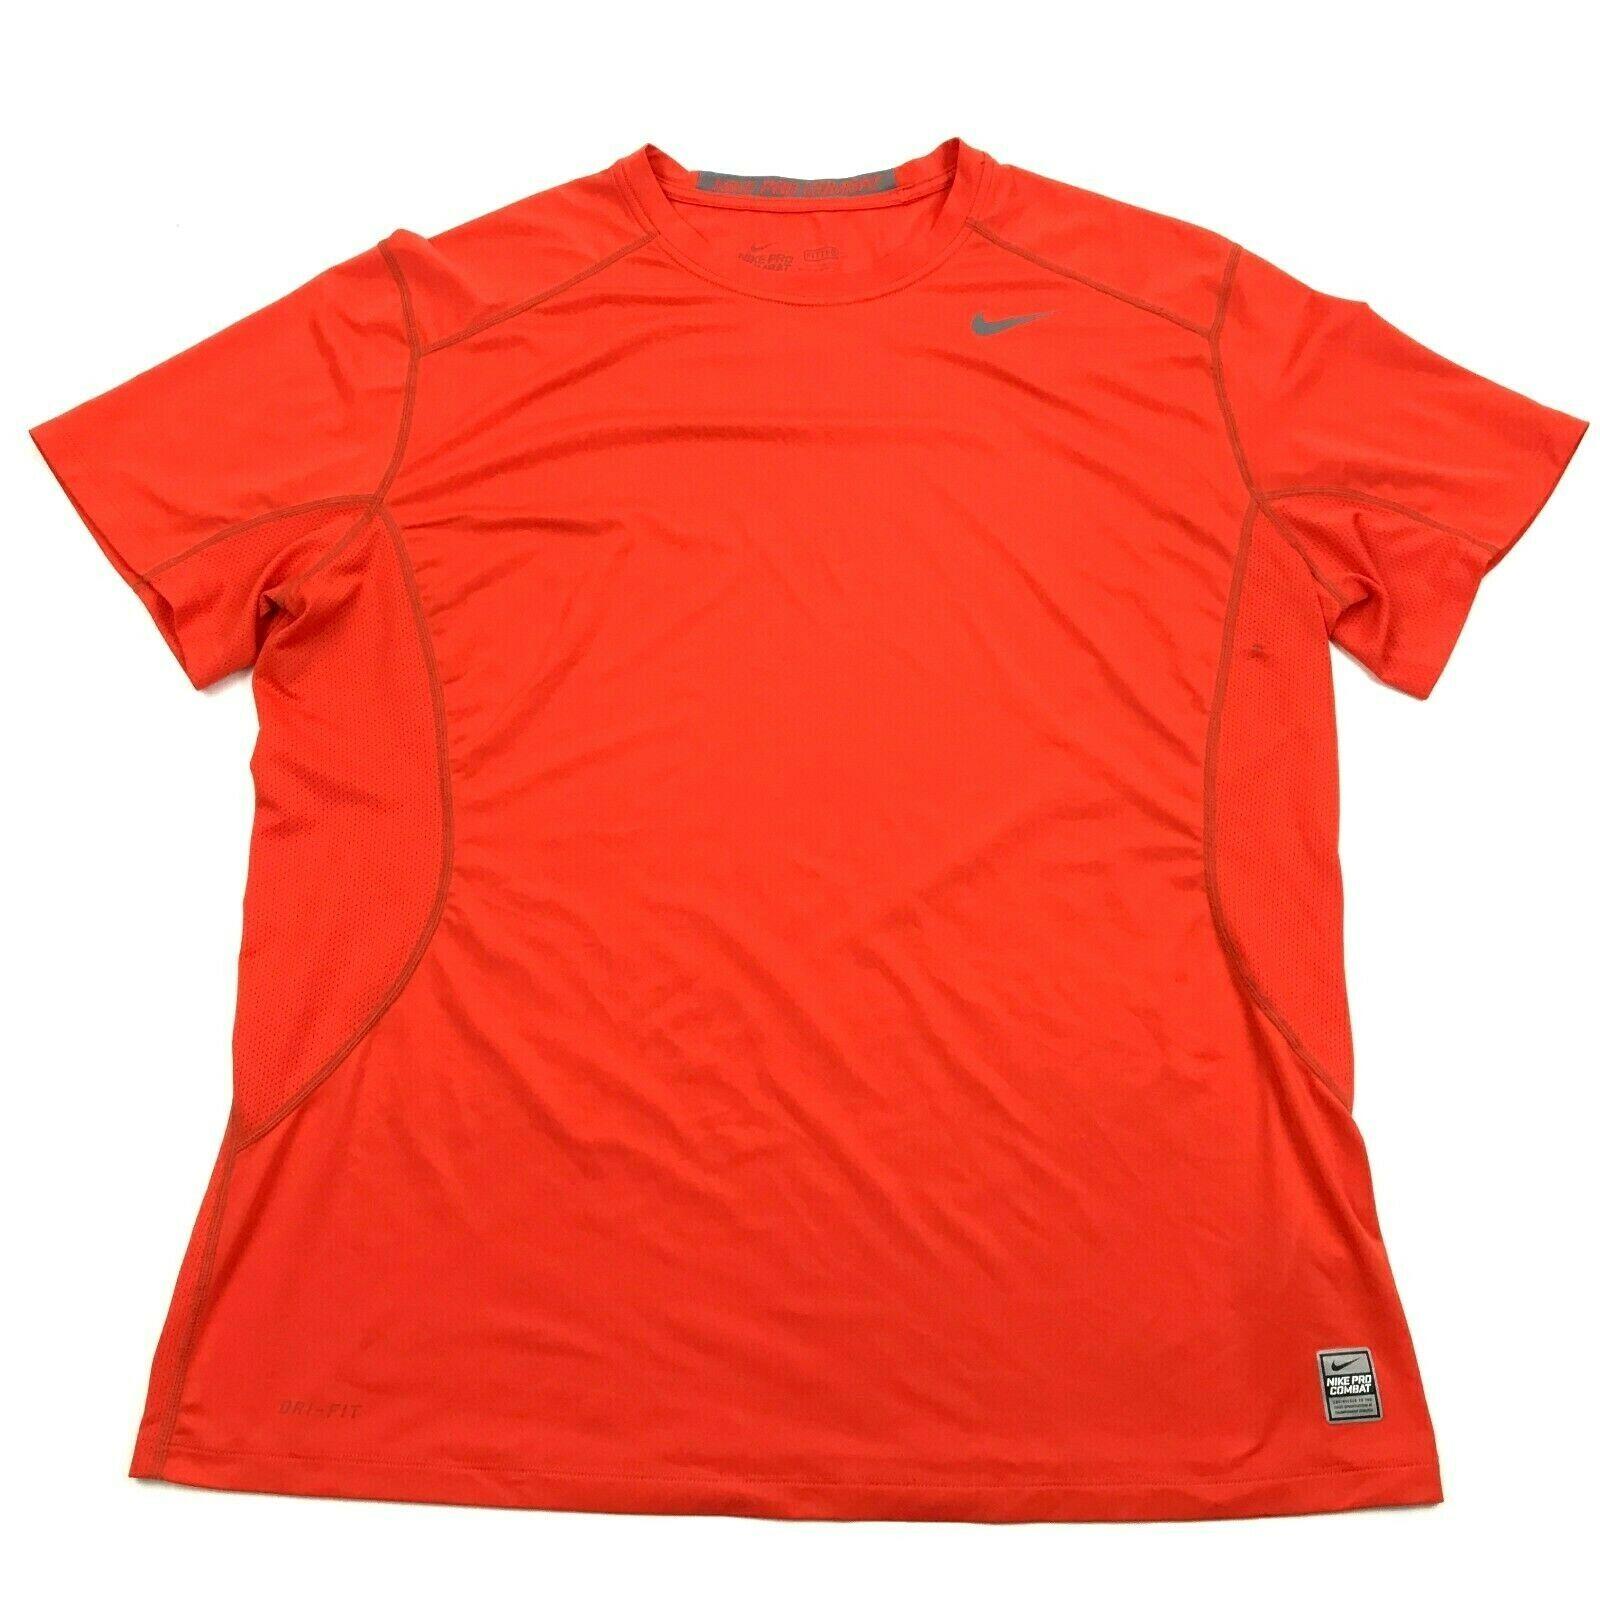 NIKE PRO COMBAT Men's Size 2XL XXL FITTED DRI-FIT Tee Ventilated Short Sleeve 2X - $22.58